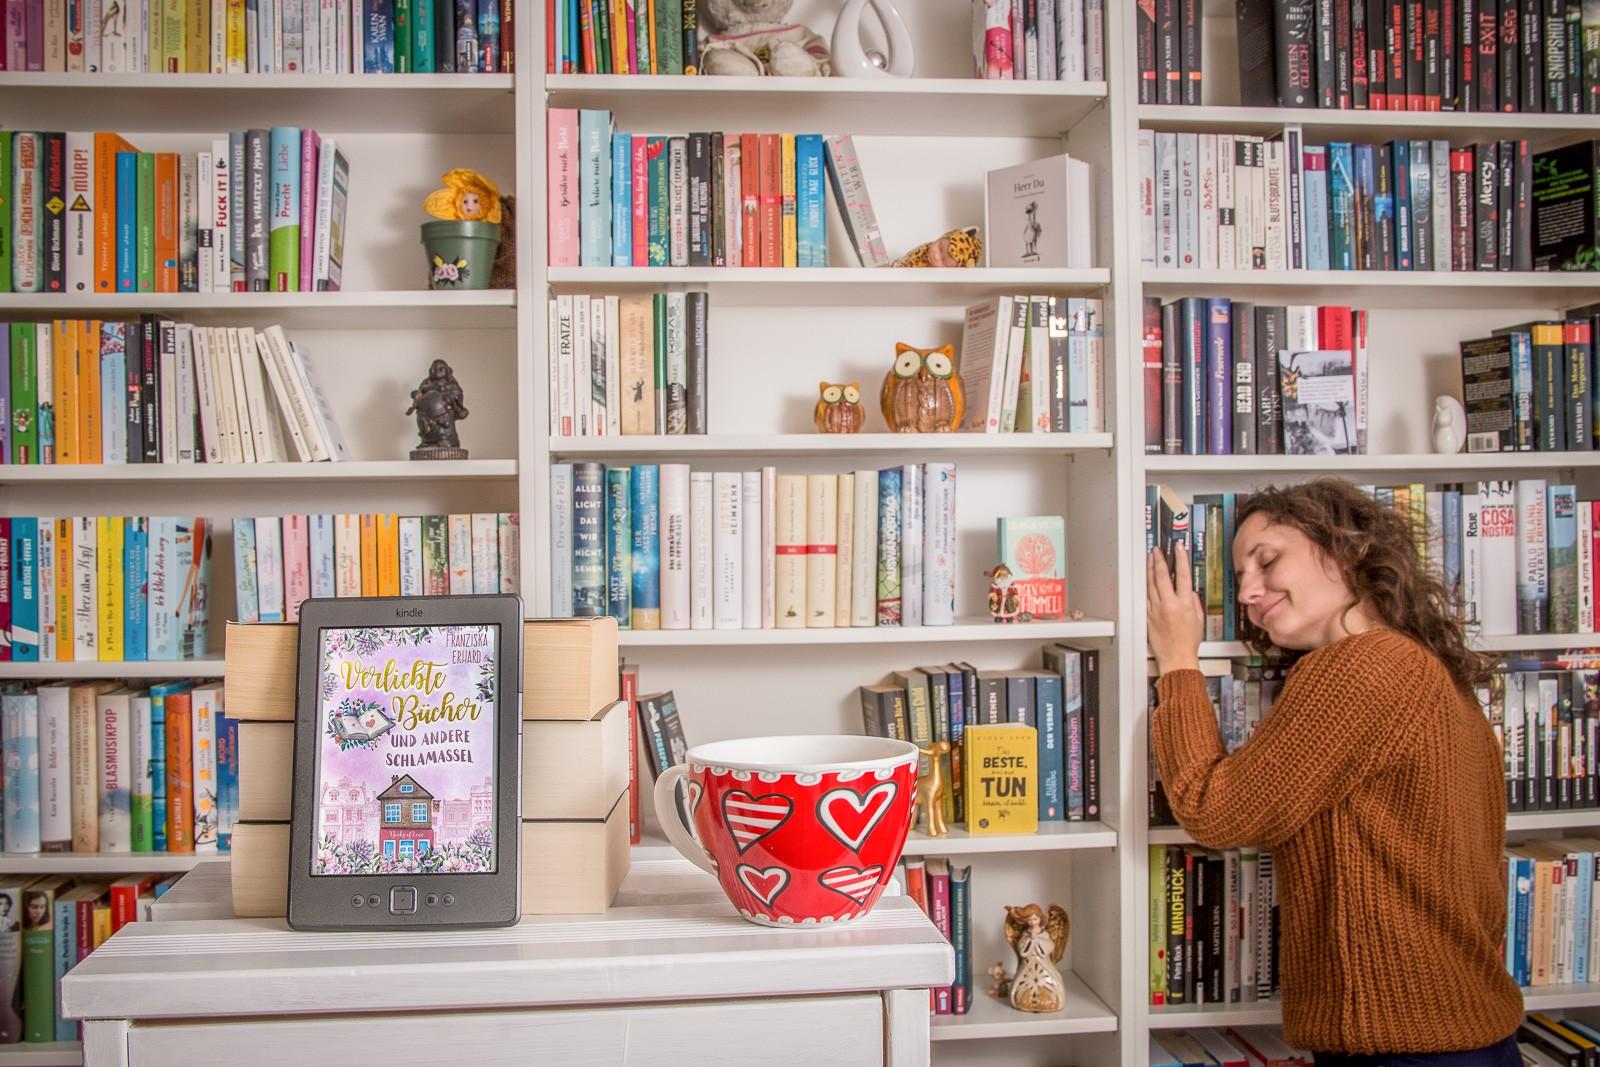 Verliebte Bücher - Franziska Erhard